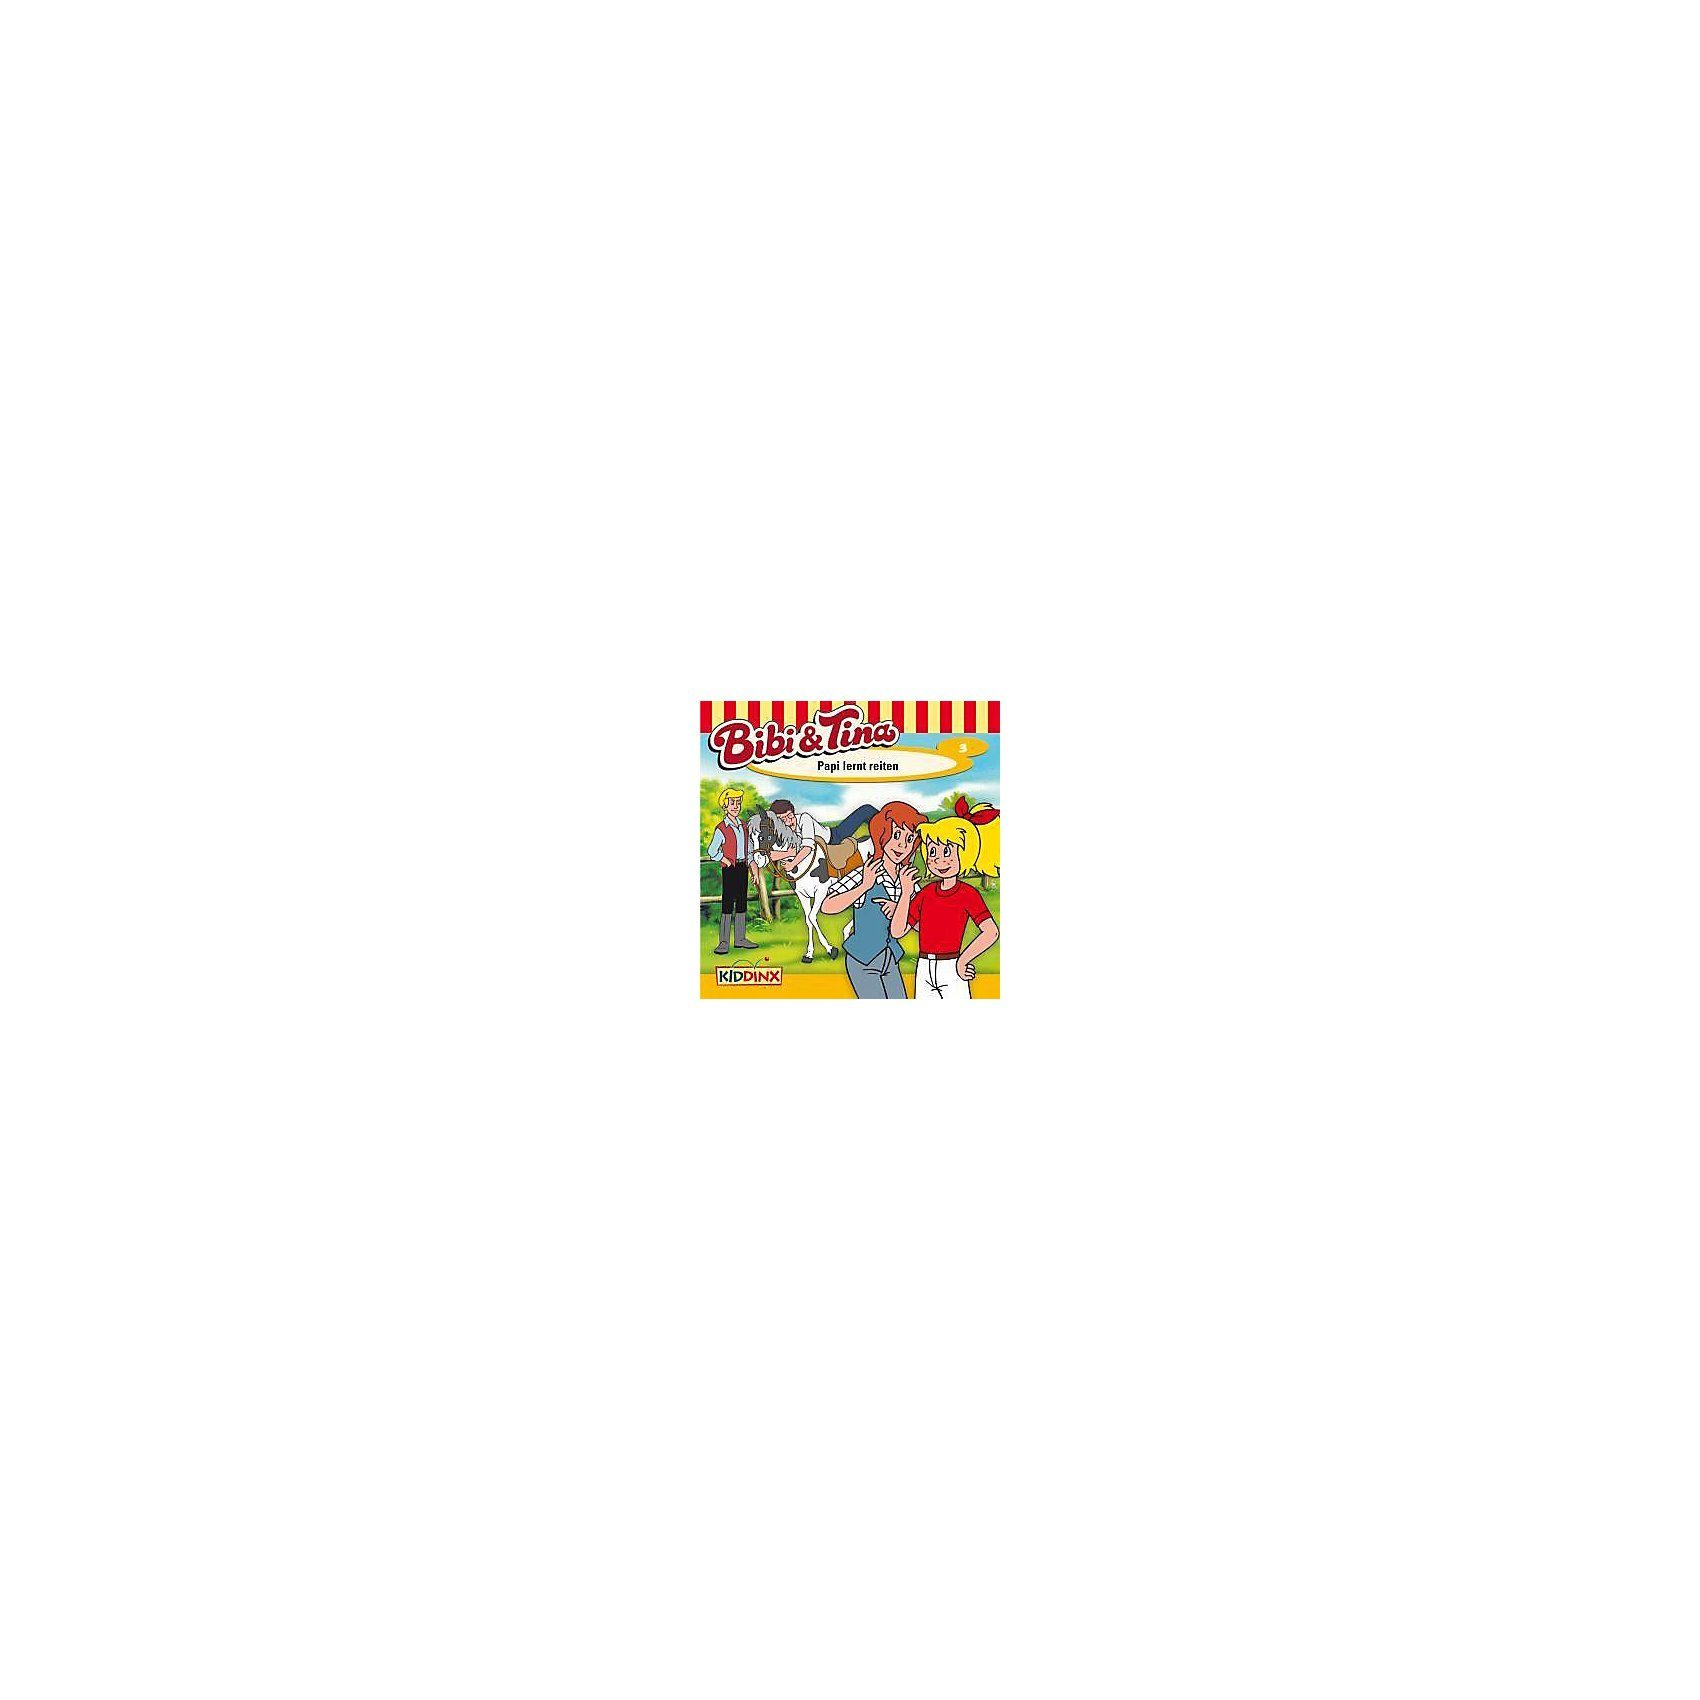 Kiddinx CD Bibi & Tina 03 - Papi lernt reiten